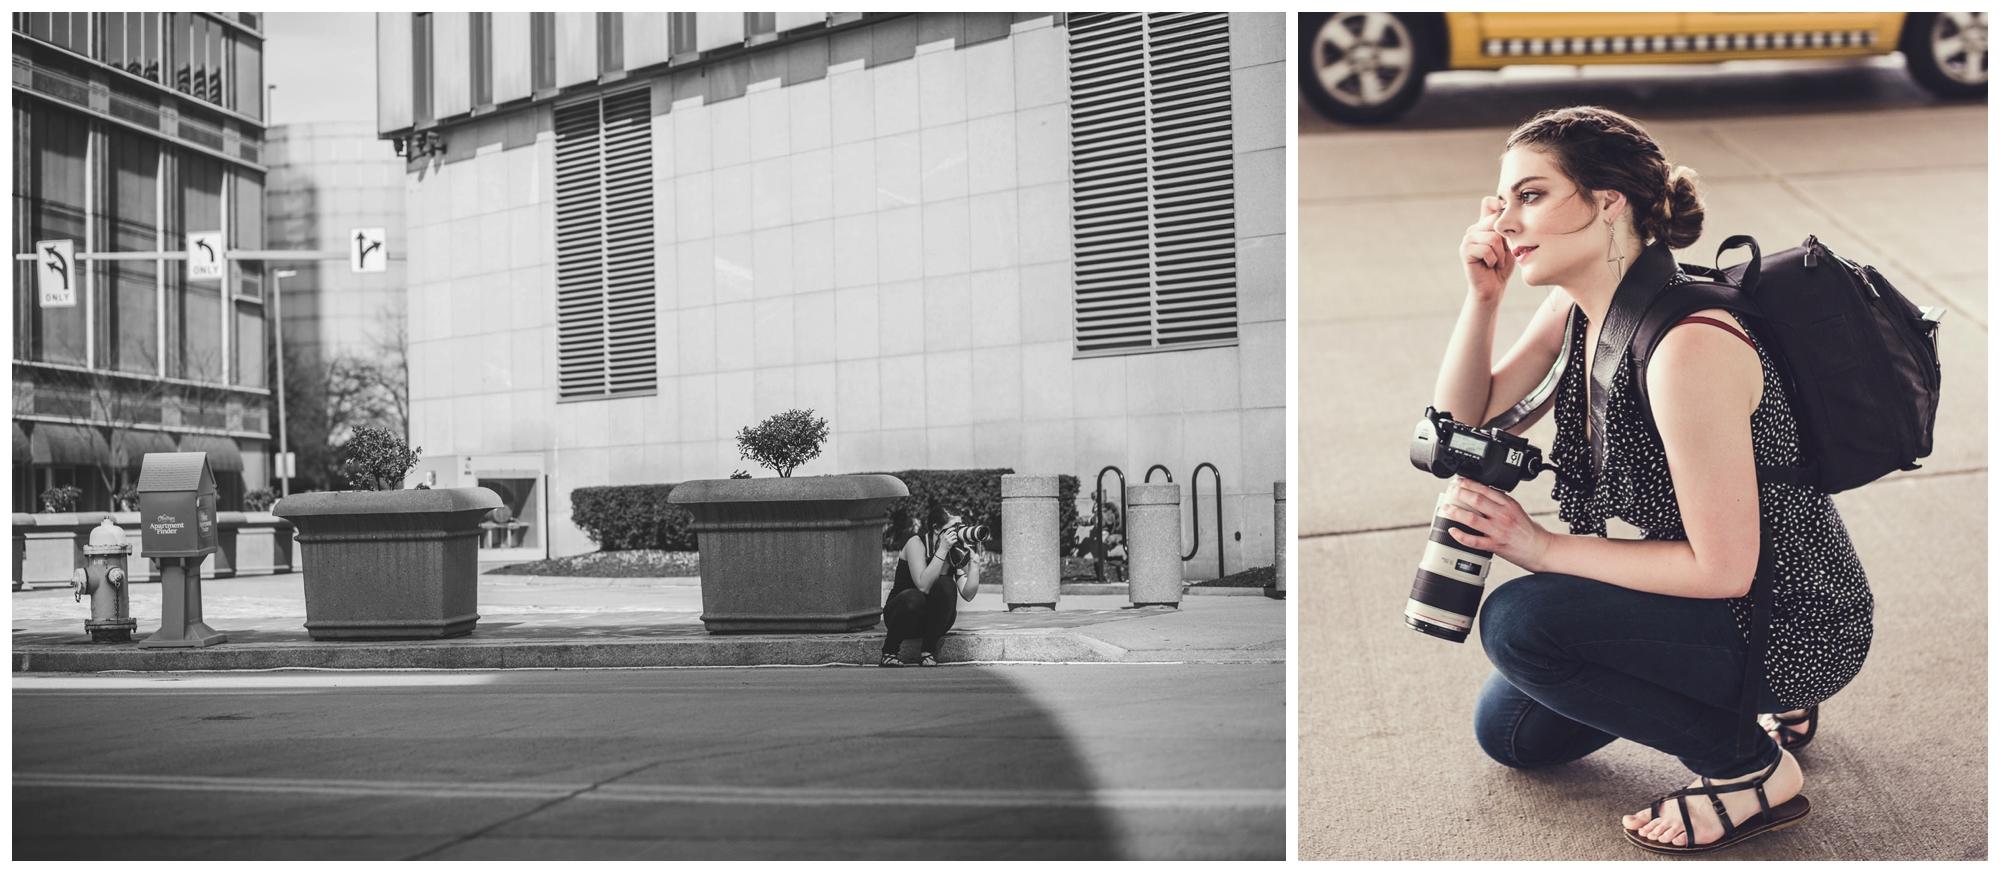 Images by Leah Schonauer